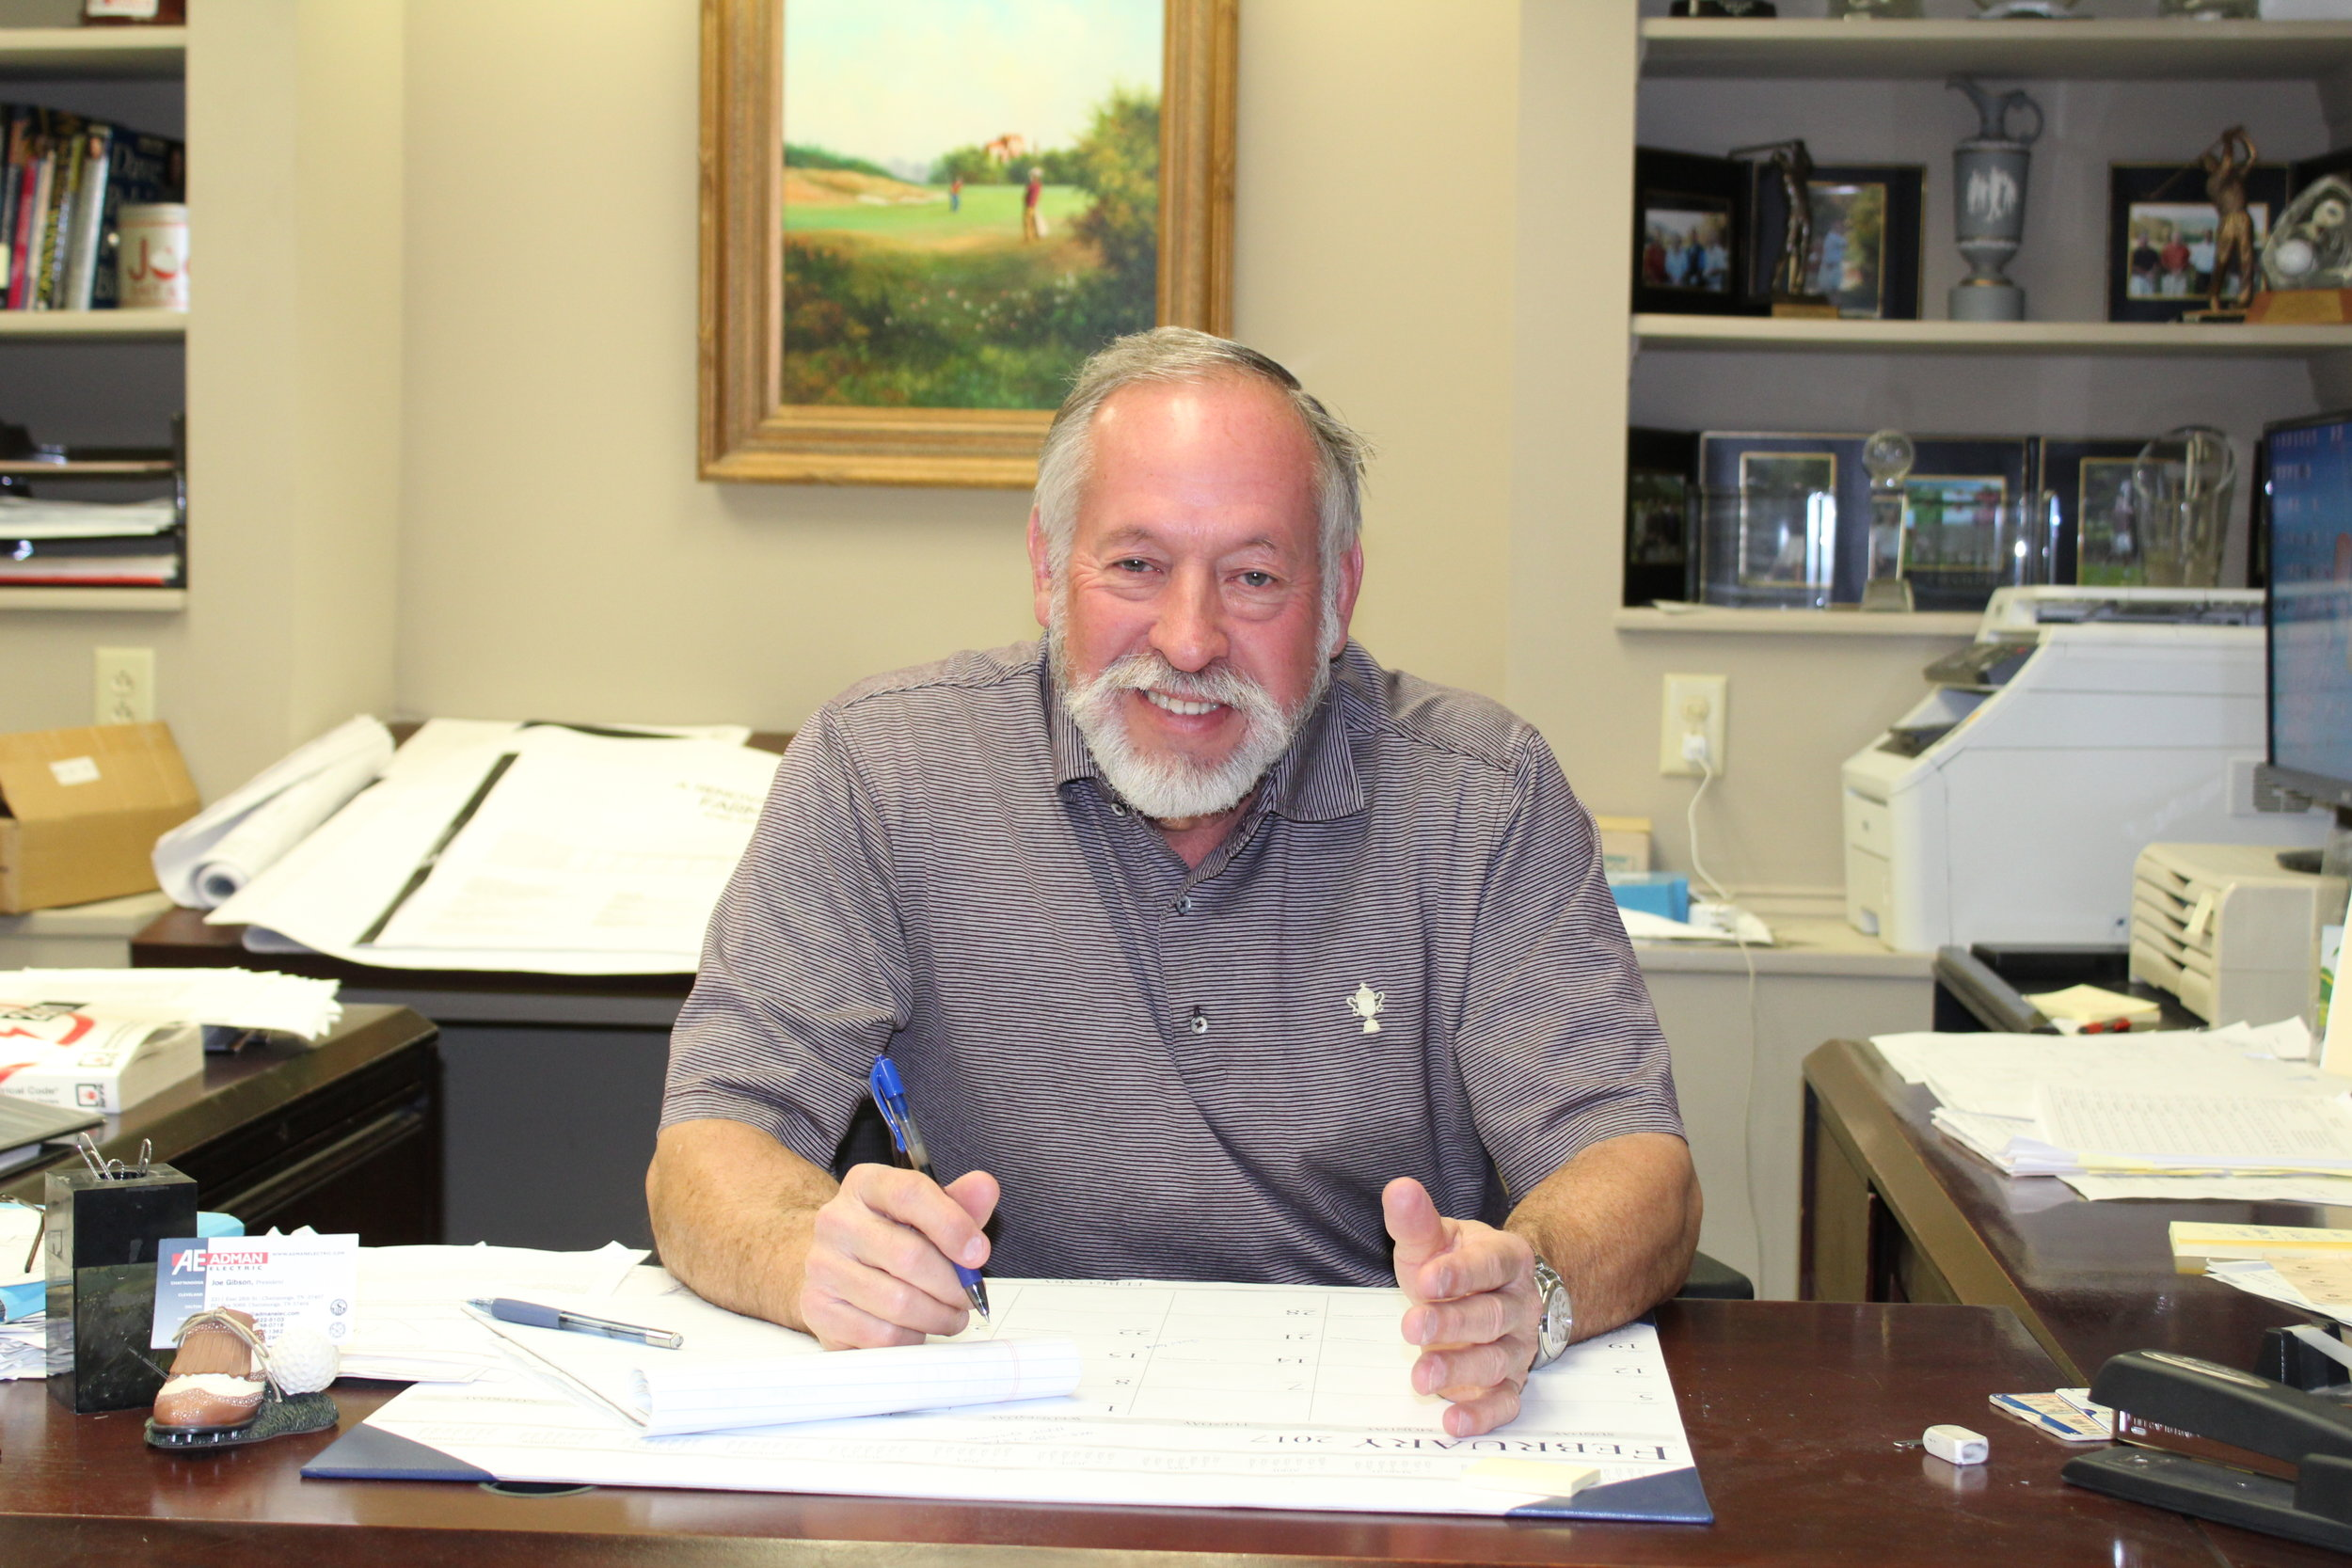 Joe Gibson  CEO   E-mail   JGibson@admanelectric.com   Phone  423/622-5103  Fax  423/698-0716  Mobile  423/595-1362